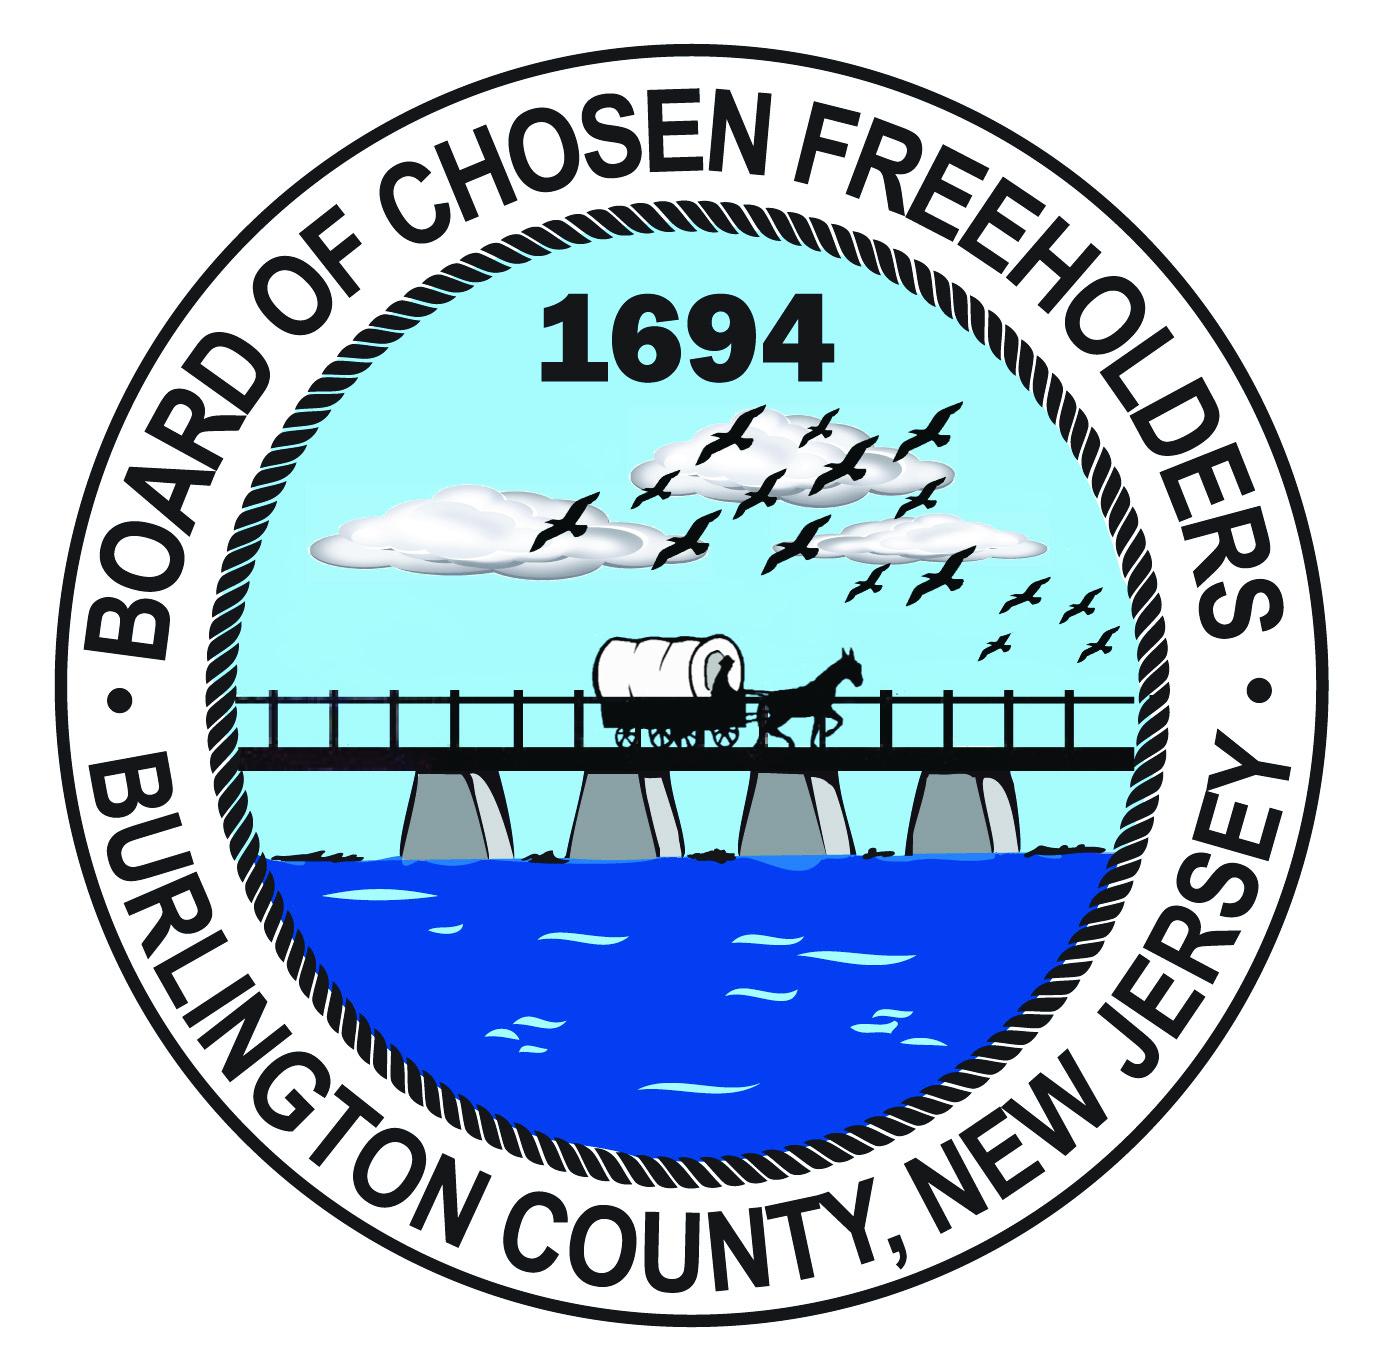 We Buy Houses in Burlington County NJ